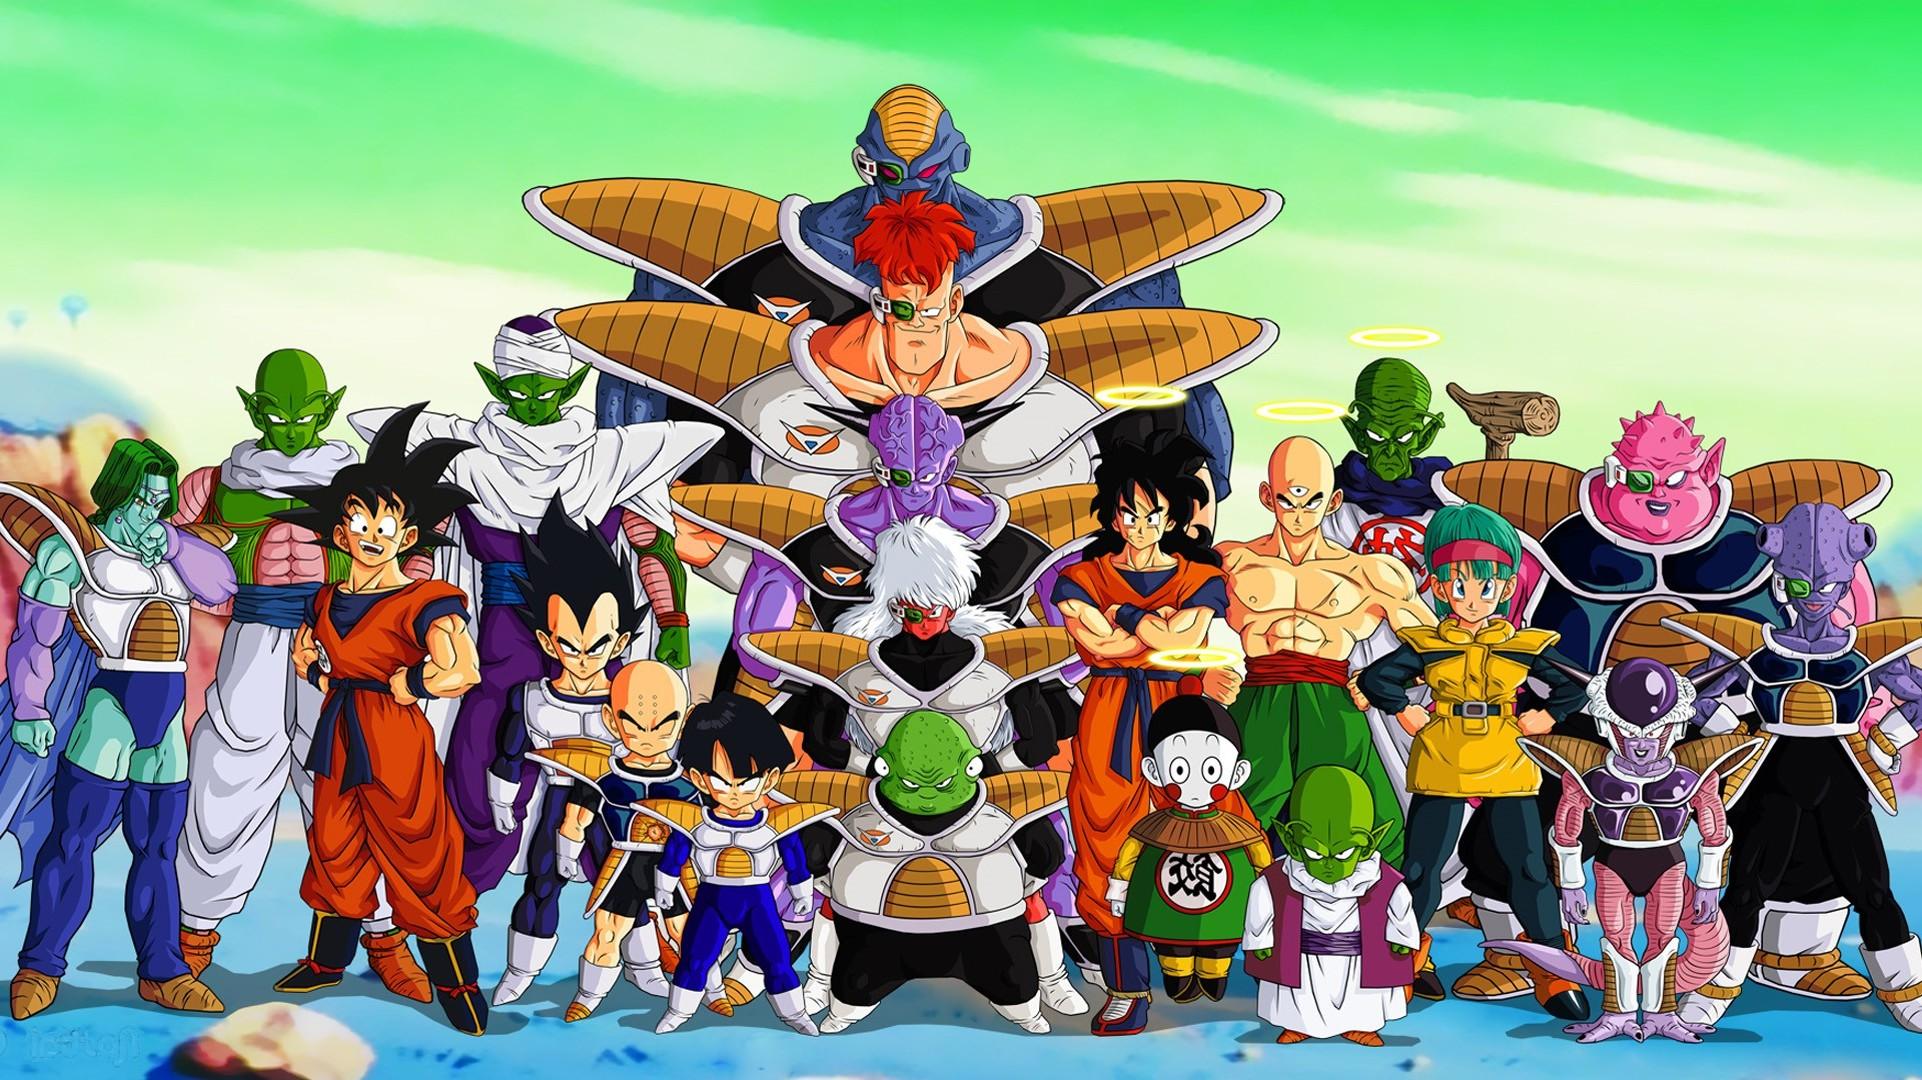 Wallpaper Illustration Anime Toy Gohan Dragon Ball Z Bulma